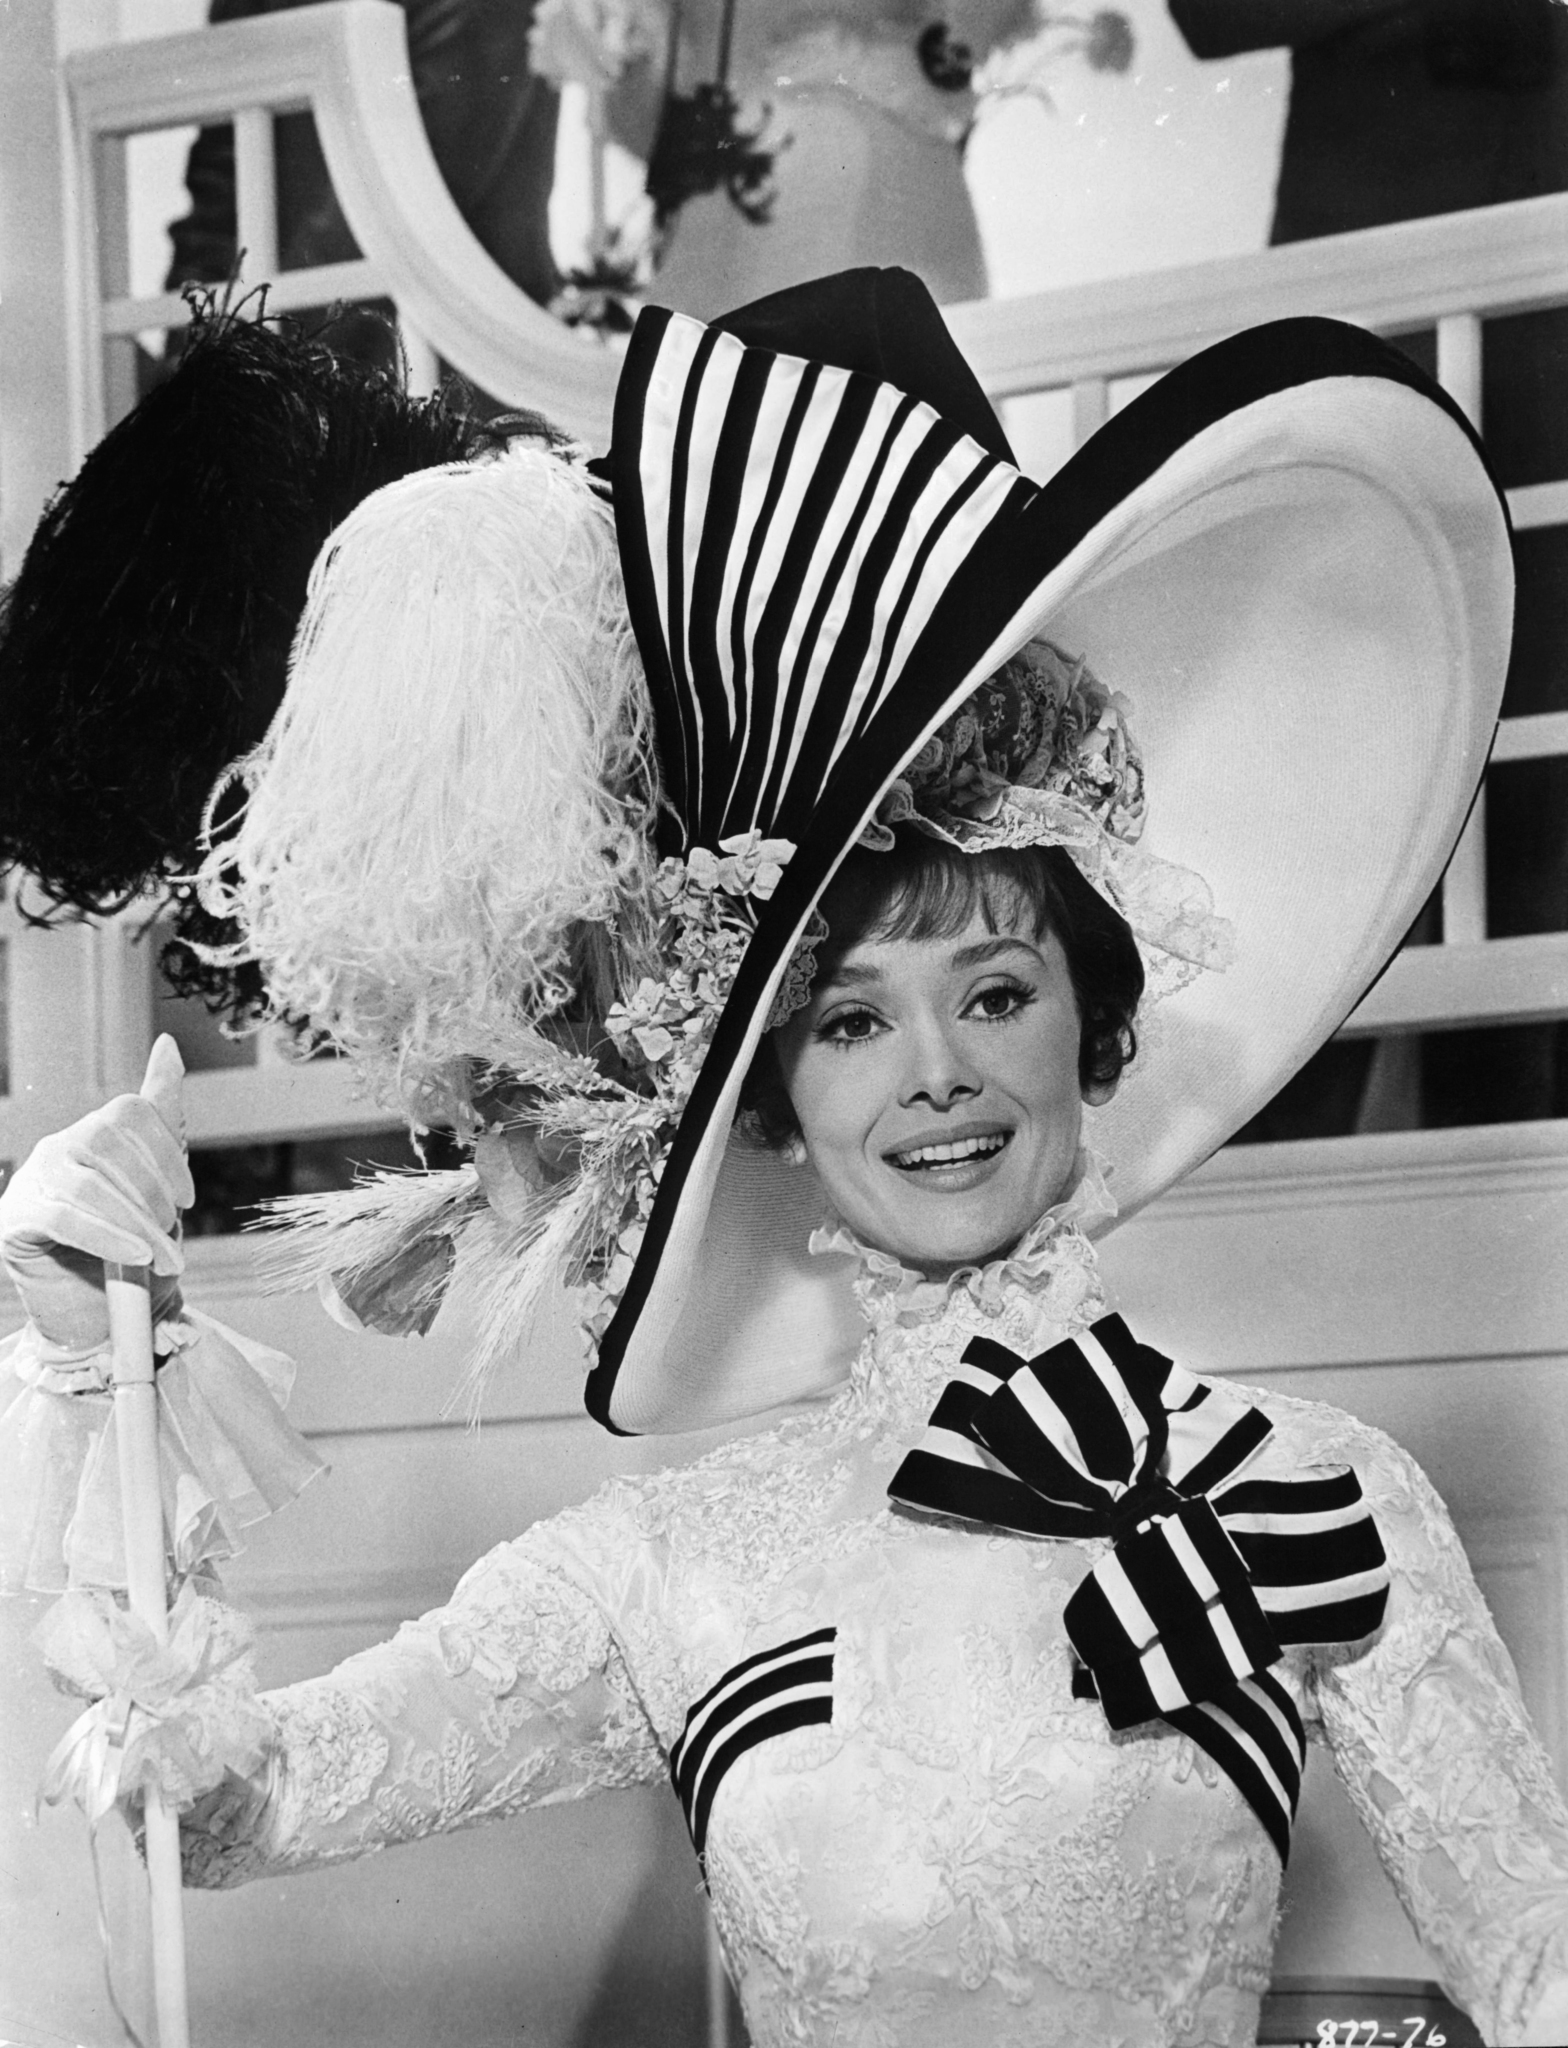 Audrey Hepburn in My Fair Lady (1964)